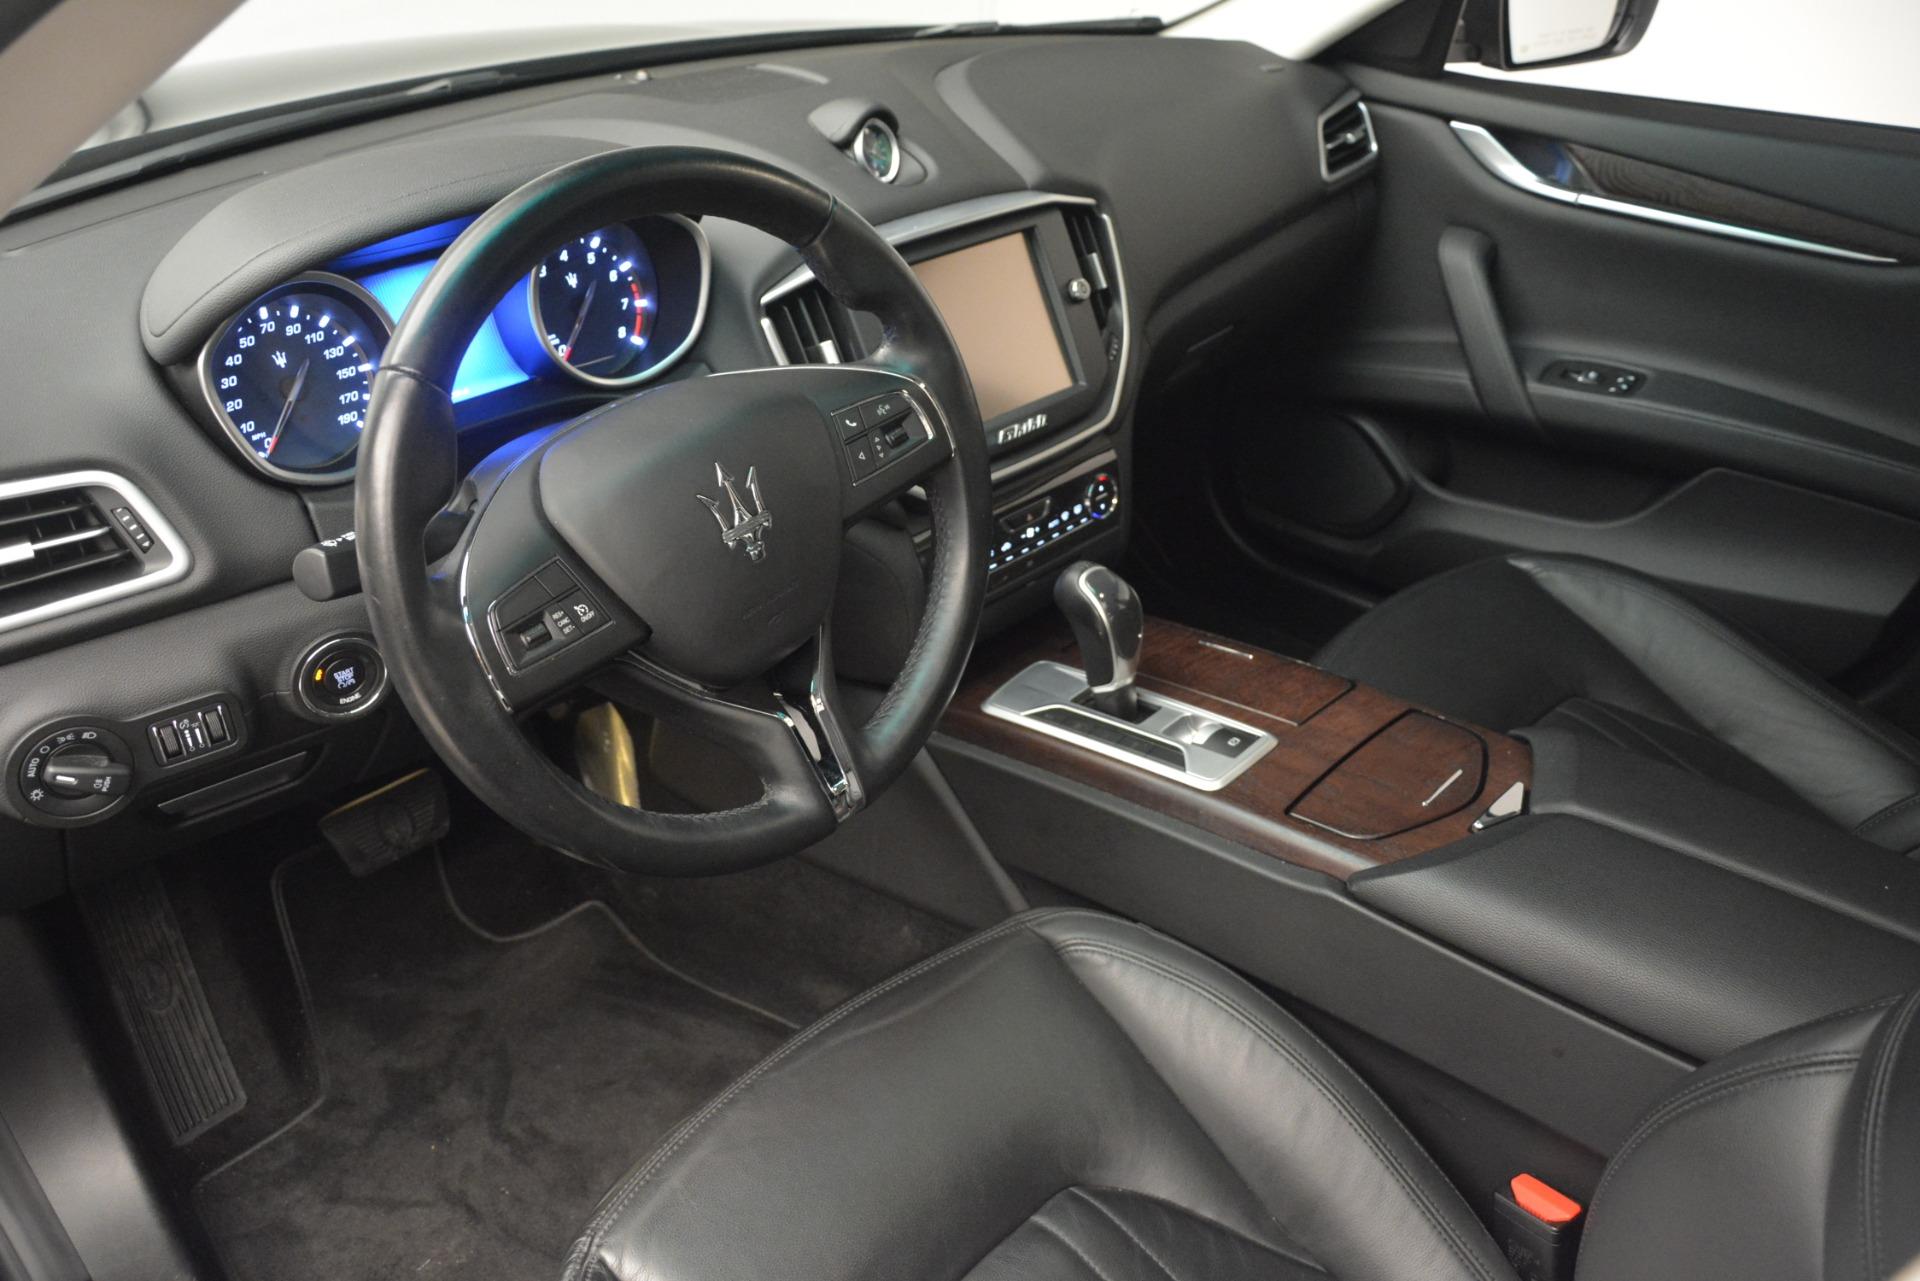 Used 2015 Maserati Ghibli S Q4 For Sale In Greenwich, CT. Alfa Romeo of Greenwich, 7536 3102_p14